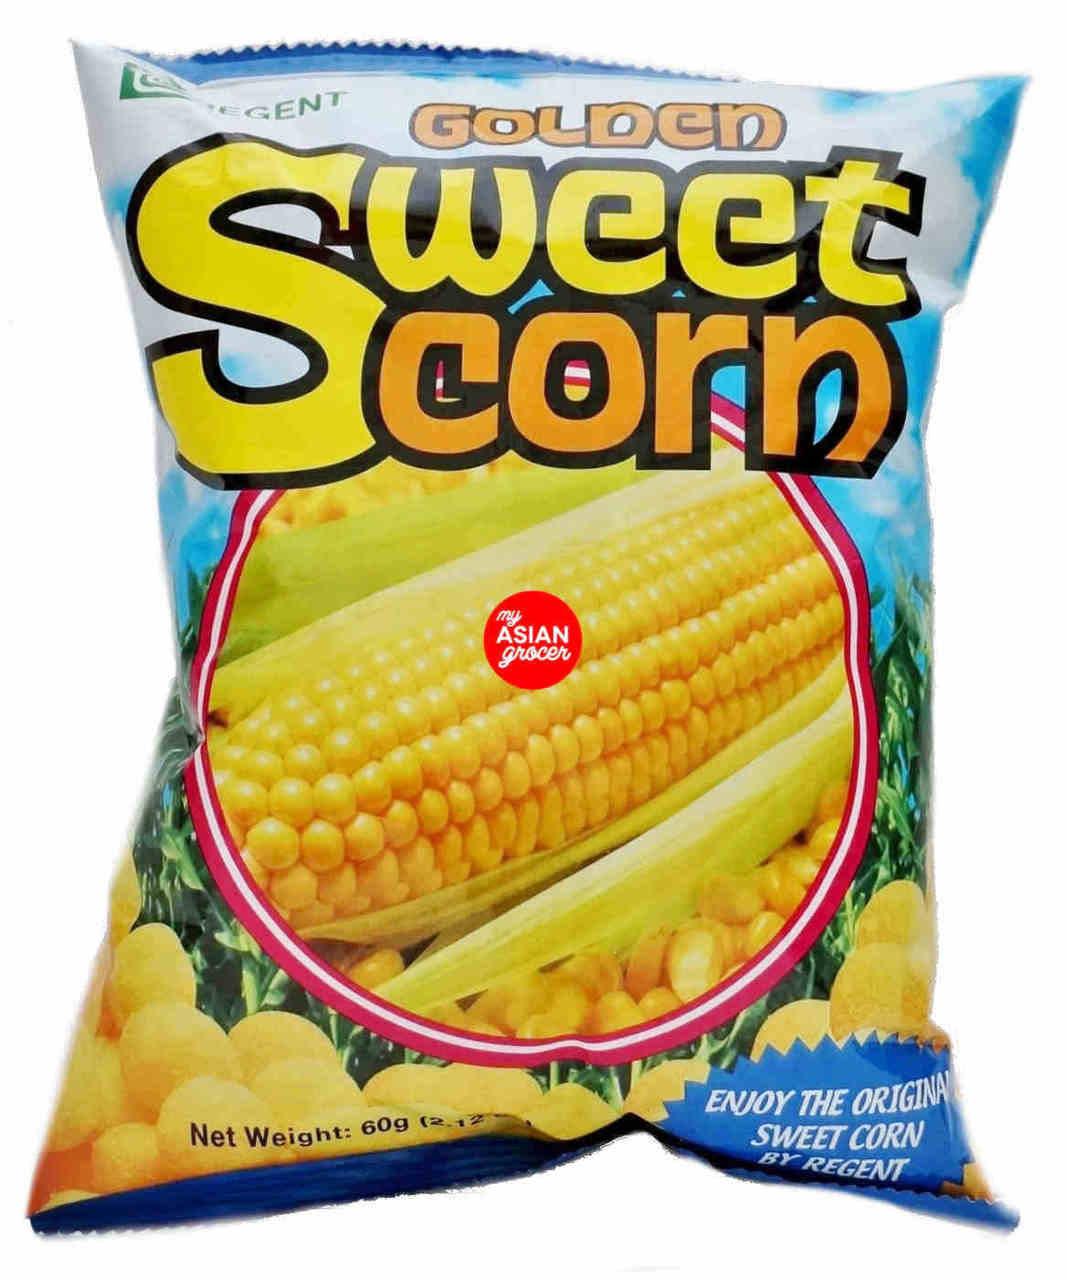 Regent Golden Sweet Corn Chips 60g My Asian Grocer